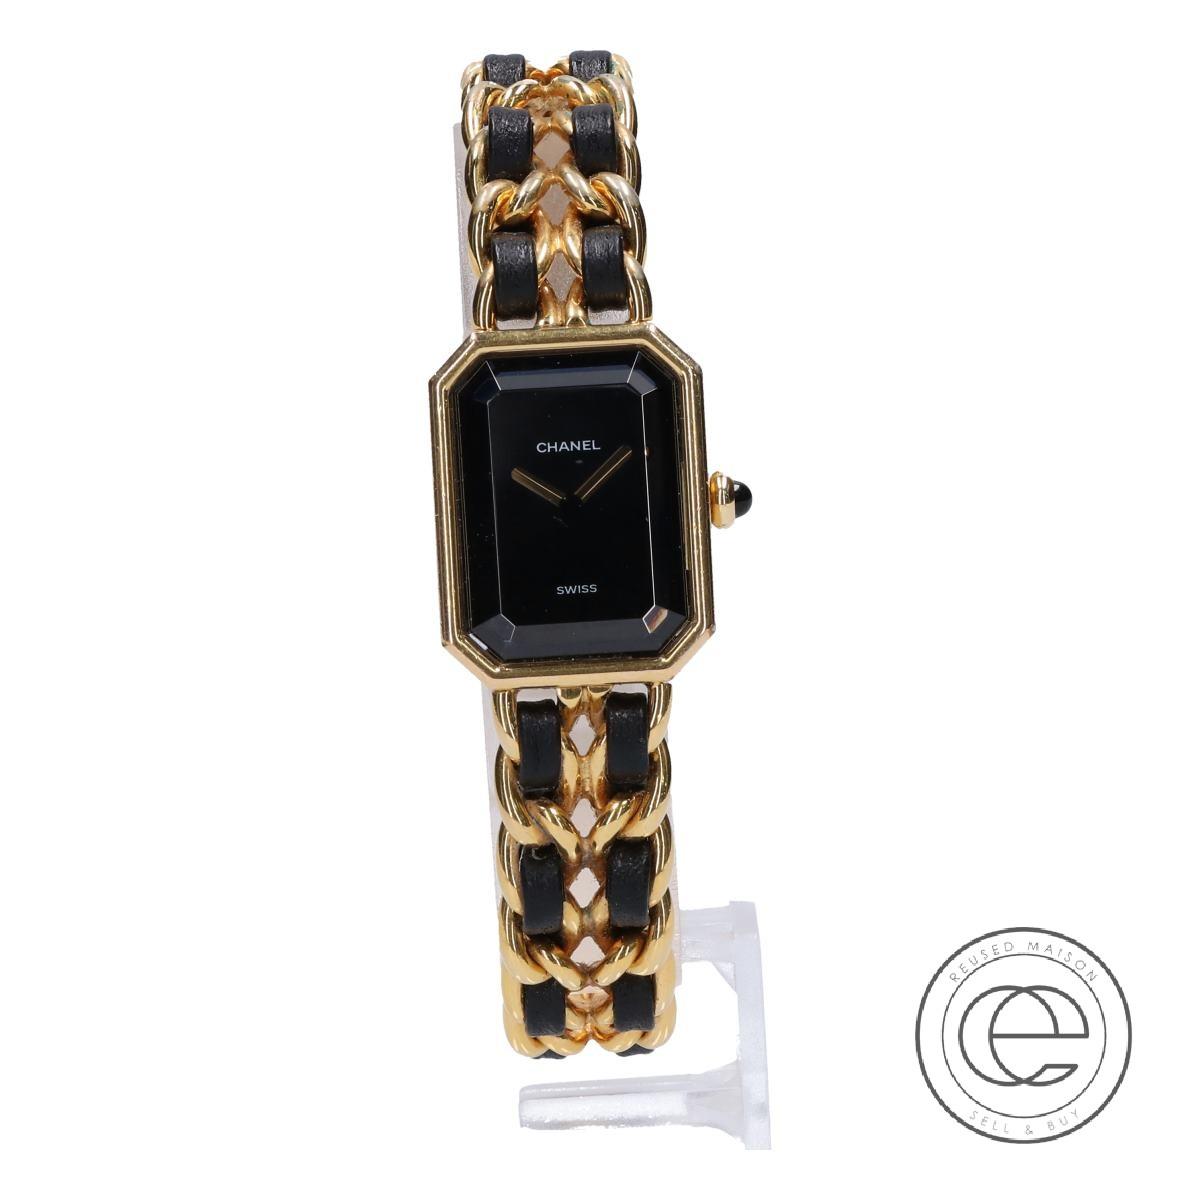 CHANELシャネル プルミエール XL GP×レザー クオーツ 腕時計 ゴールド×ブラック レディース 【中古】